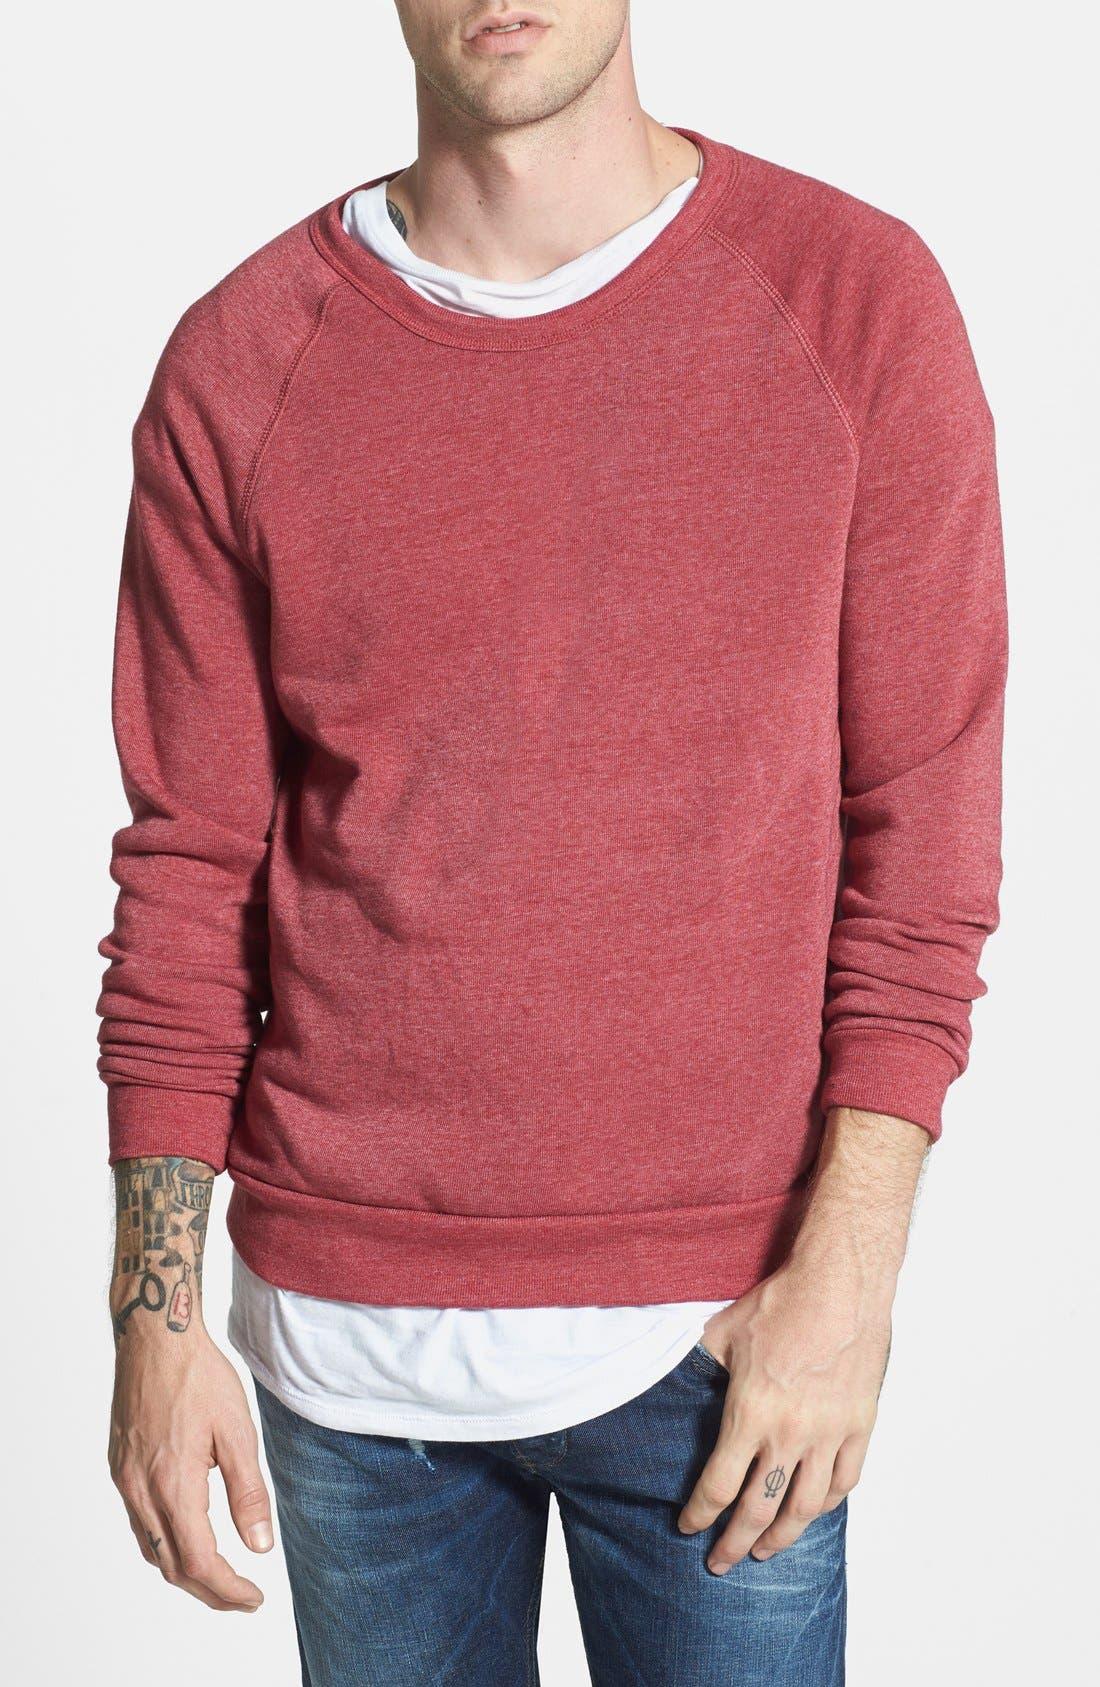 'The Champ' Sweatshirt,                             Main thumbnail 16, color,